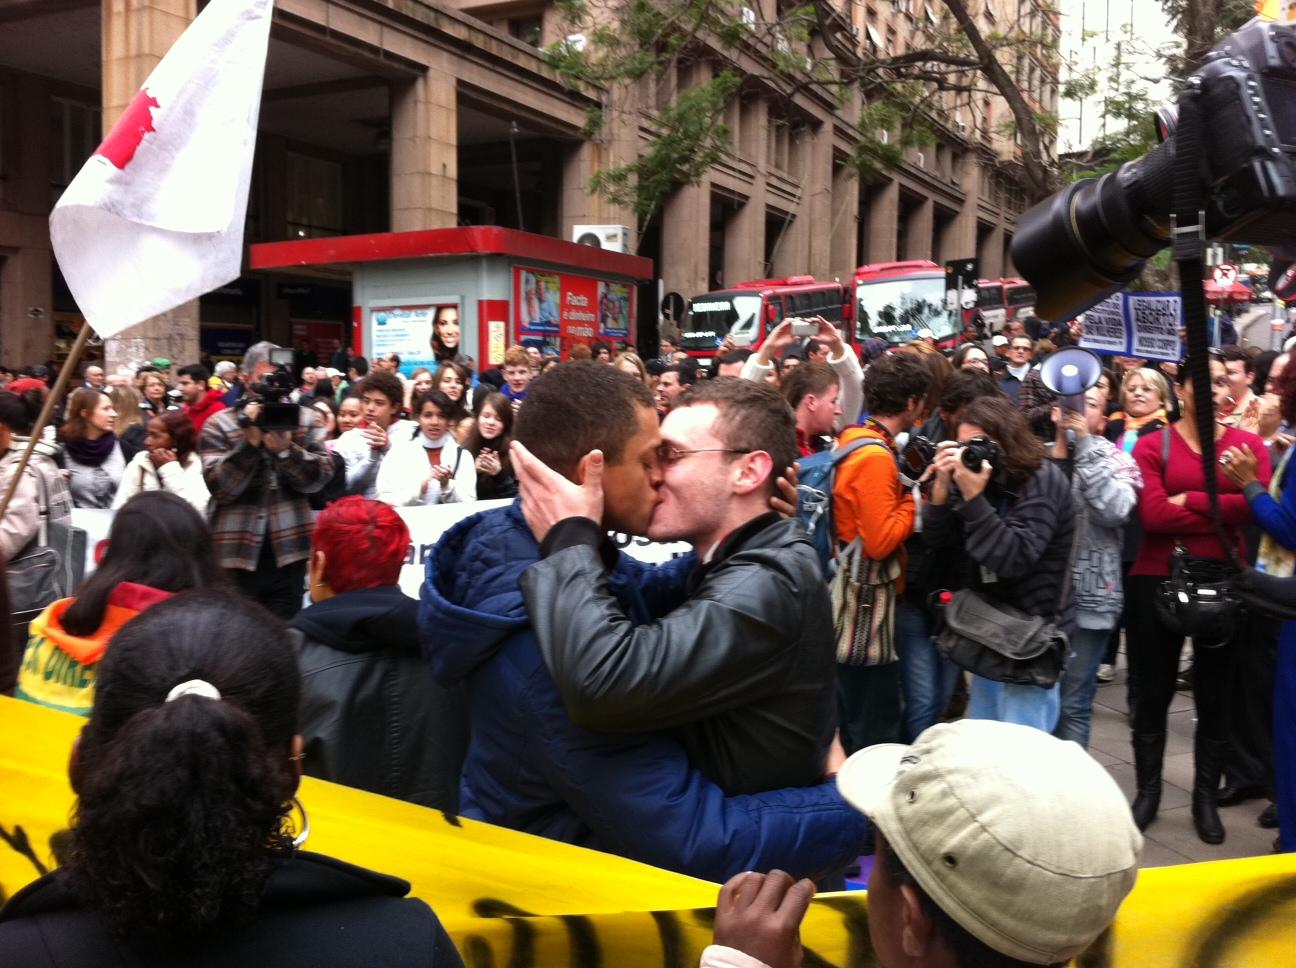 Manifestantes protestam contra a 'Cura Gay' no centro de Porto Alegre